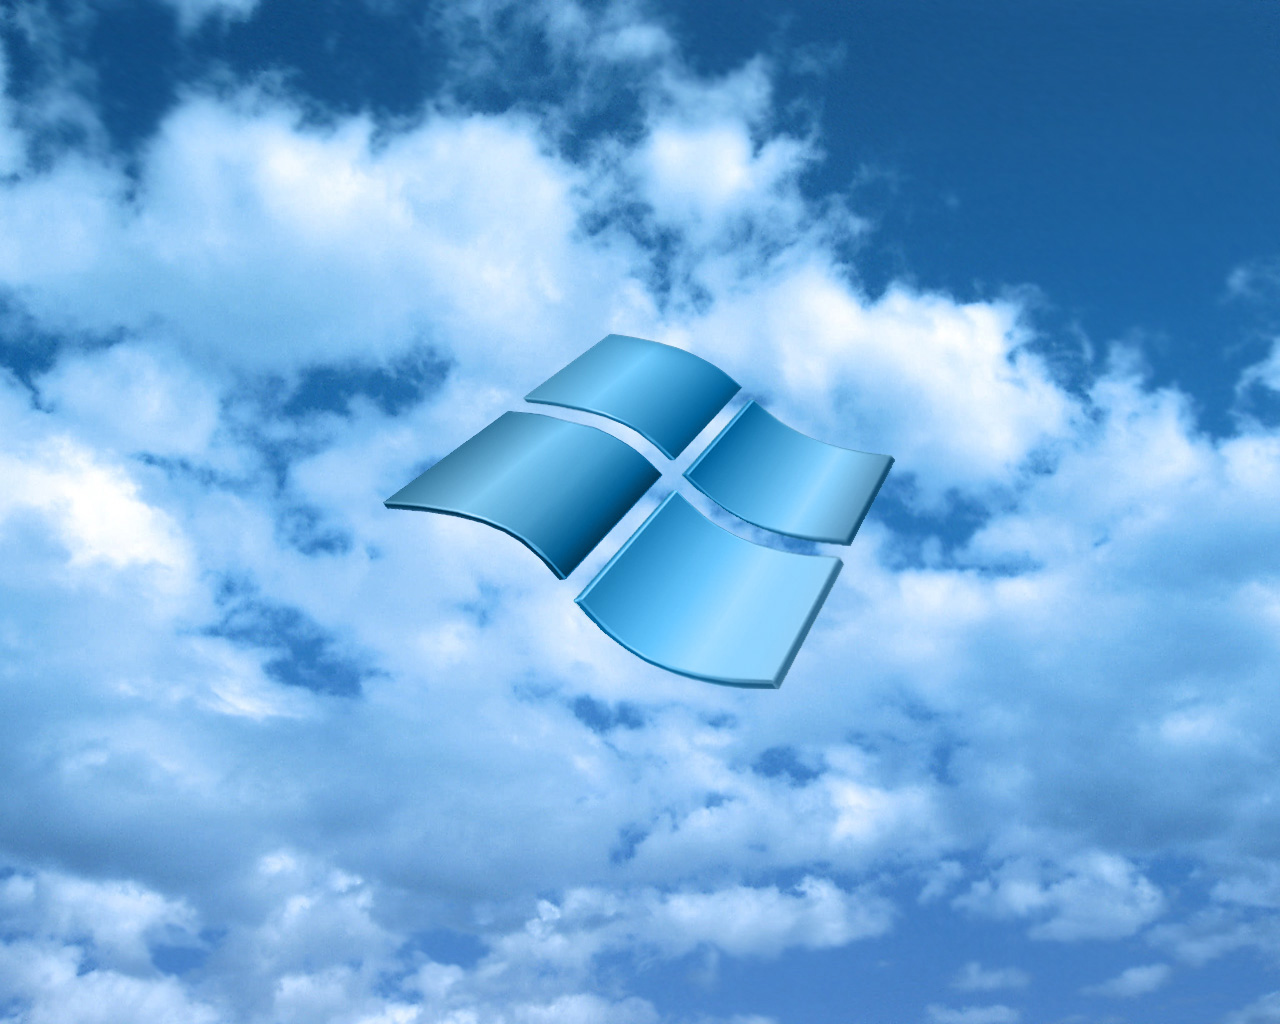 http://2.bp.blogspot.com/-kM6UqZlgQlE/T_0qf0CvOaI/AAAAAAAAHLw/2cal5YXbq54/s1600/windows-xp-wallpapers-allwalls%2B%252812%2529.jpg